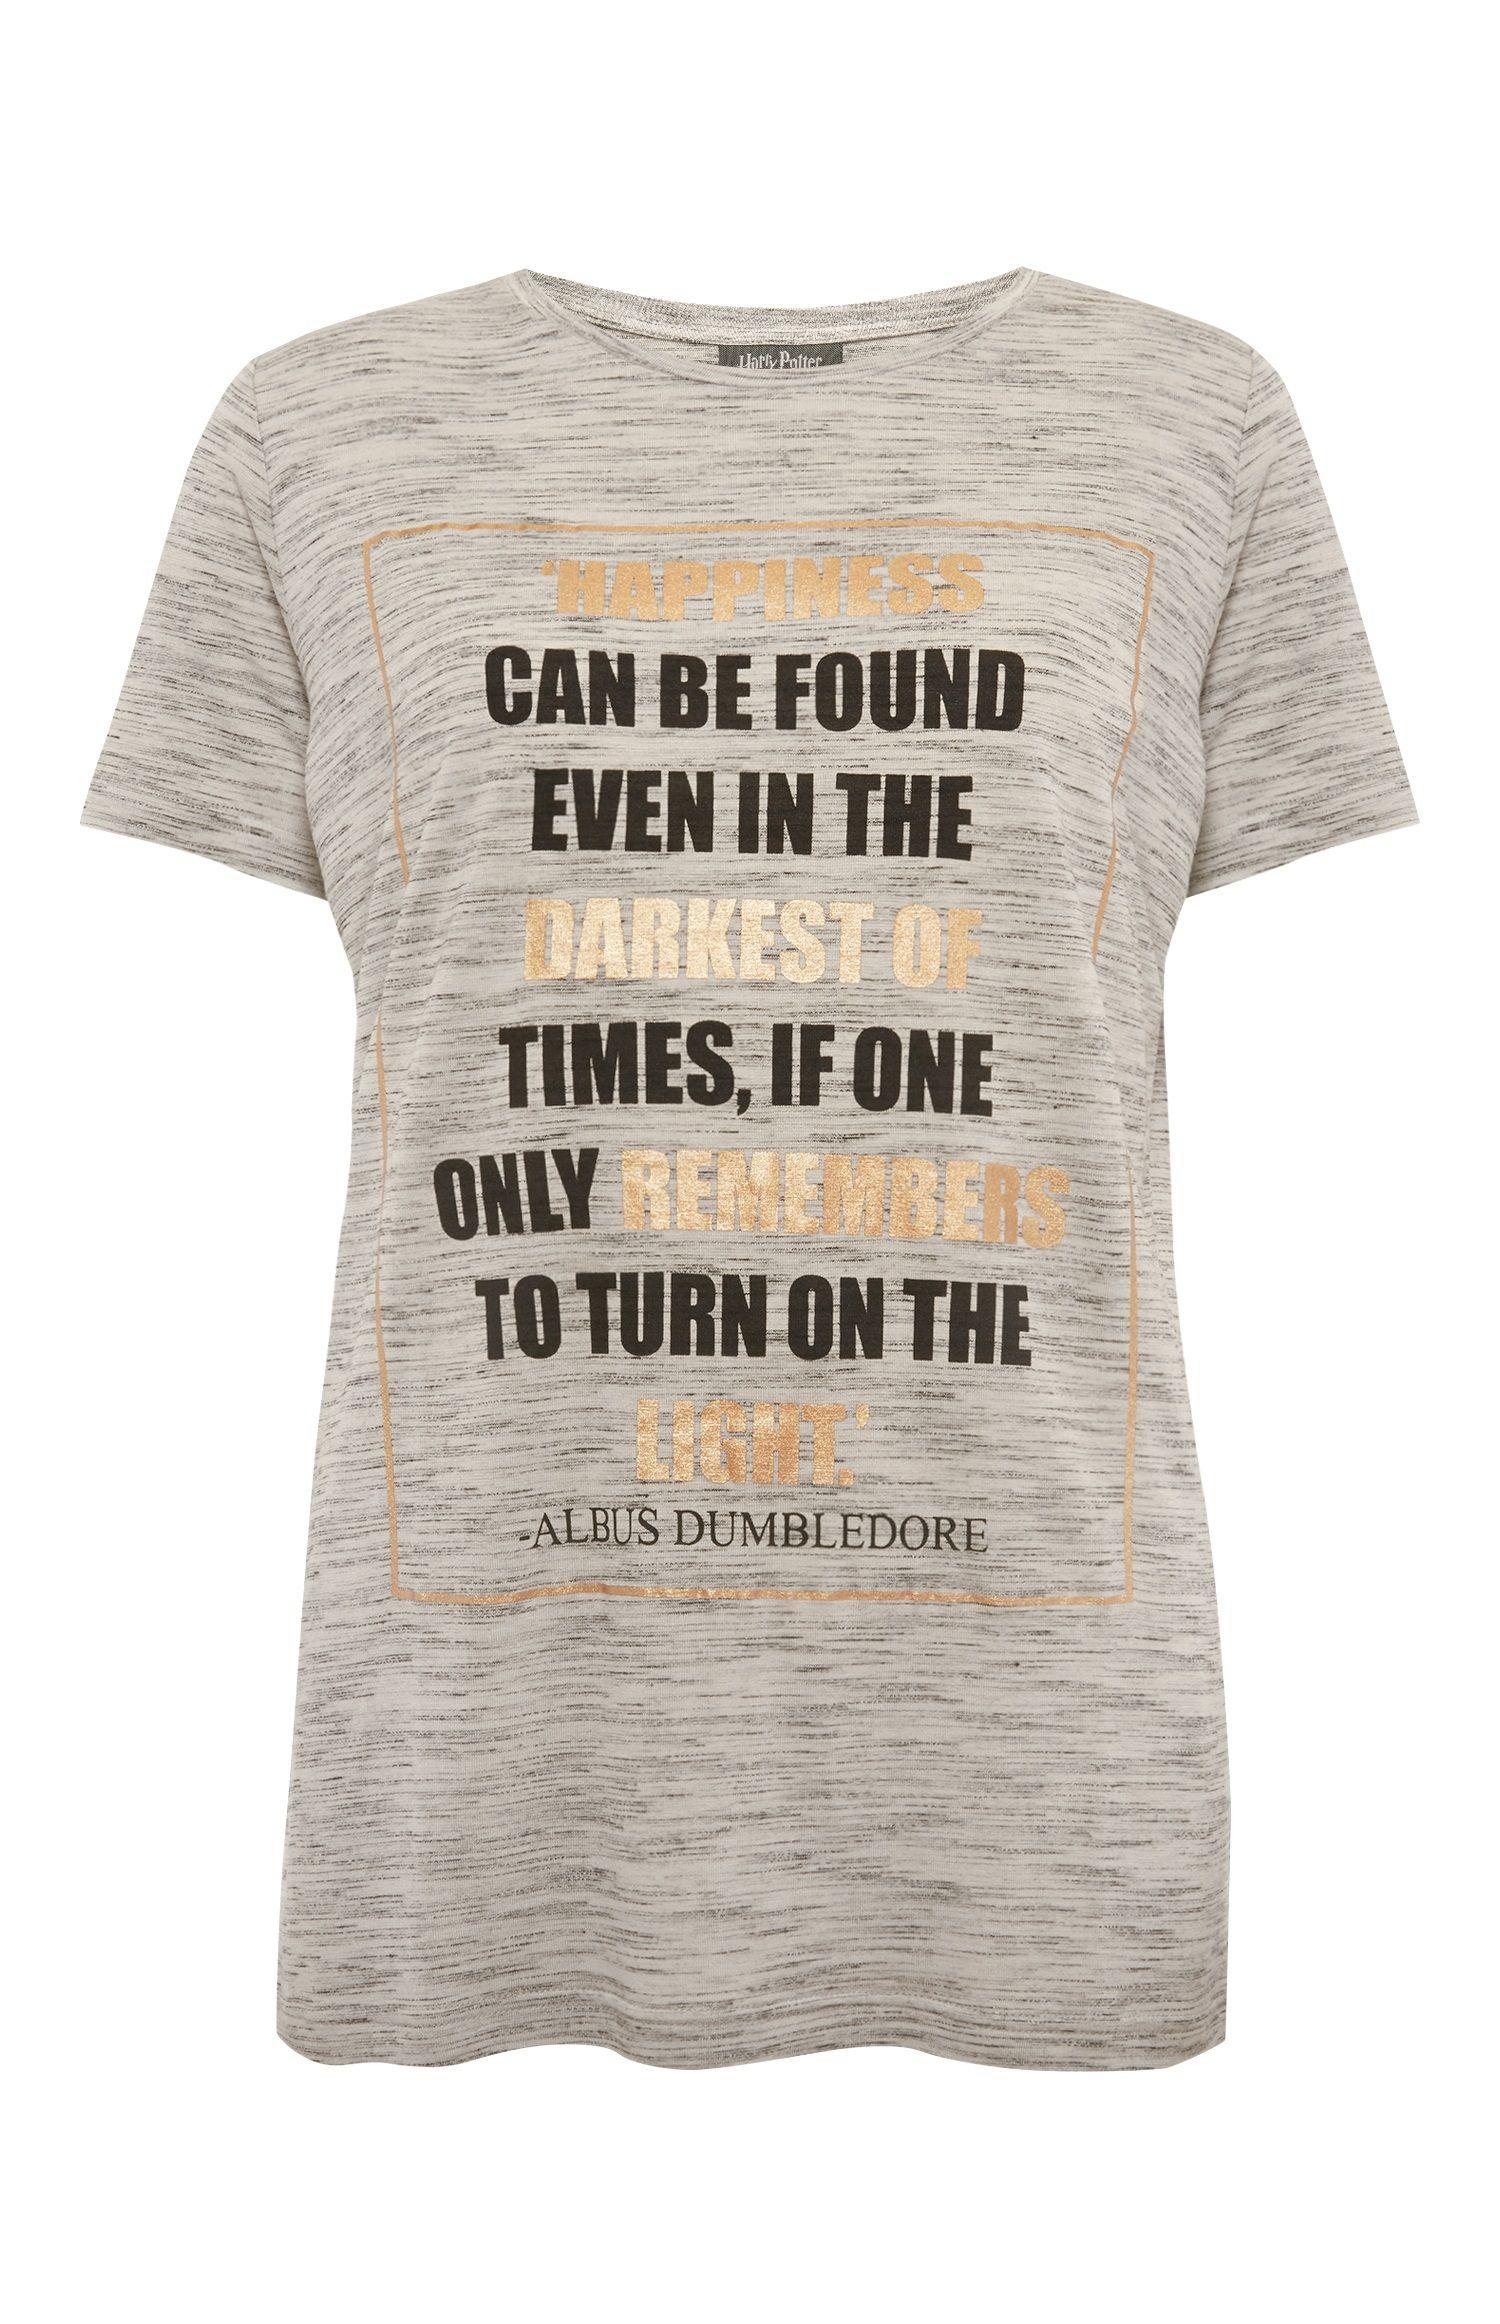 8c4909af0 Primark - Harry Potter Dumbledore Quote T-Shirt | my style | Primark ...